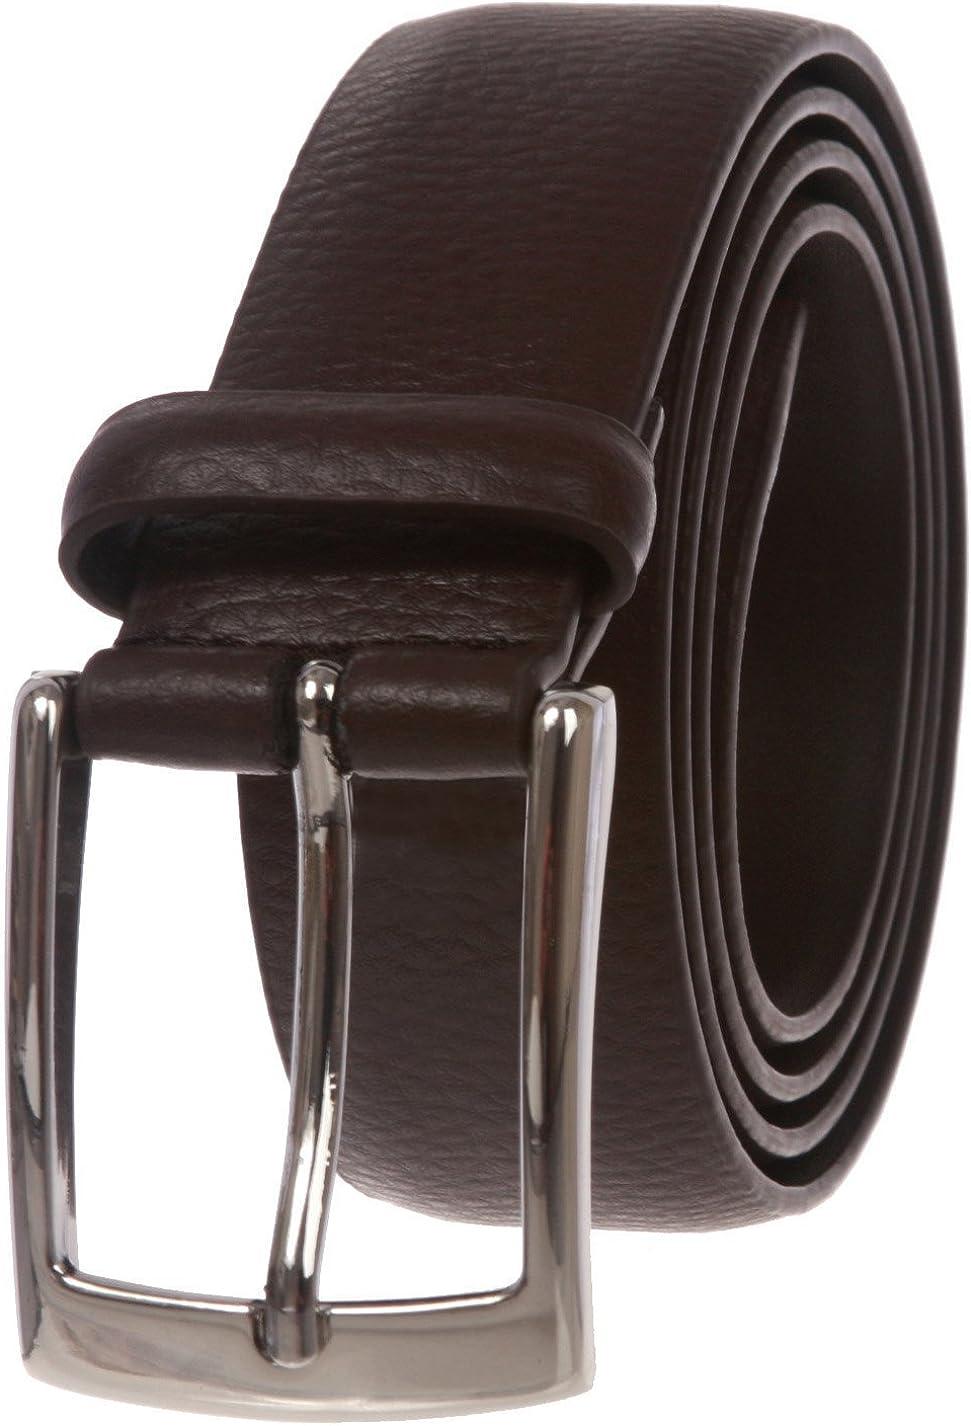 MONIQUE Men Lichee Pattern Feather Edged Quality Leather Dress 32mm Wide Belt